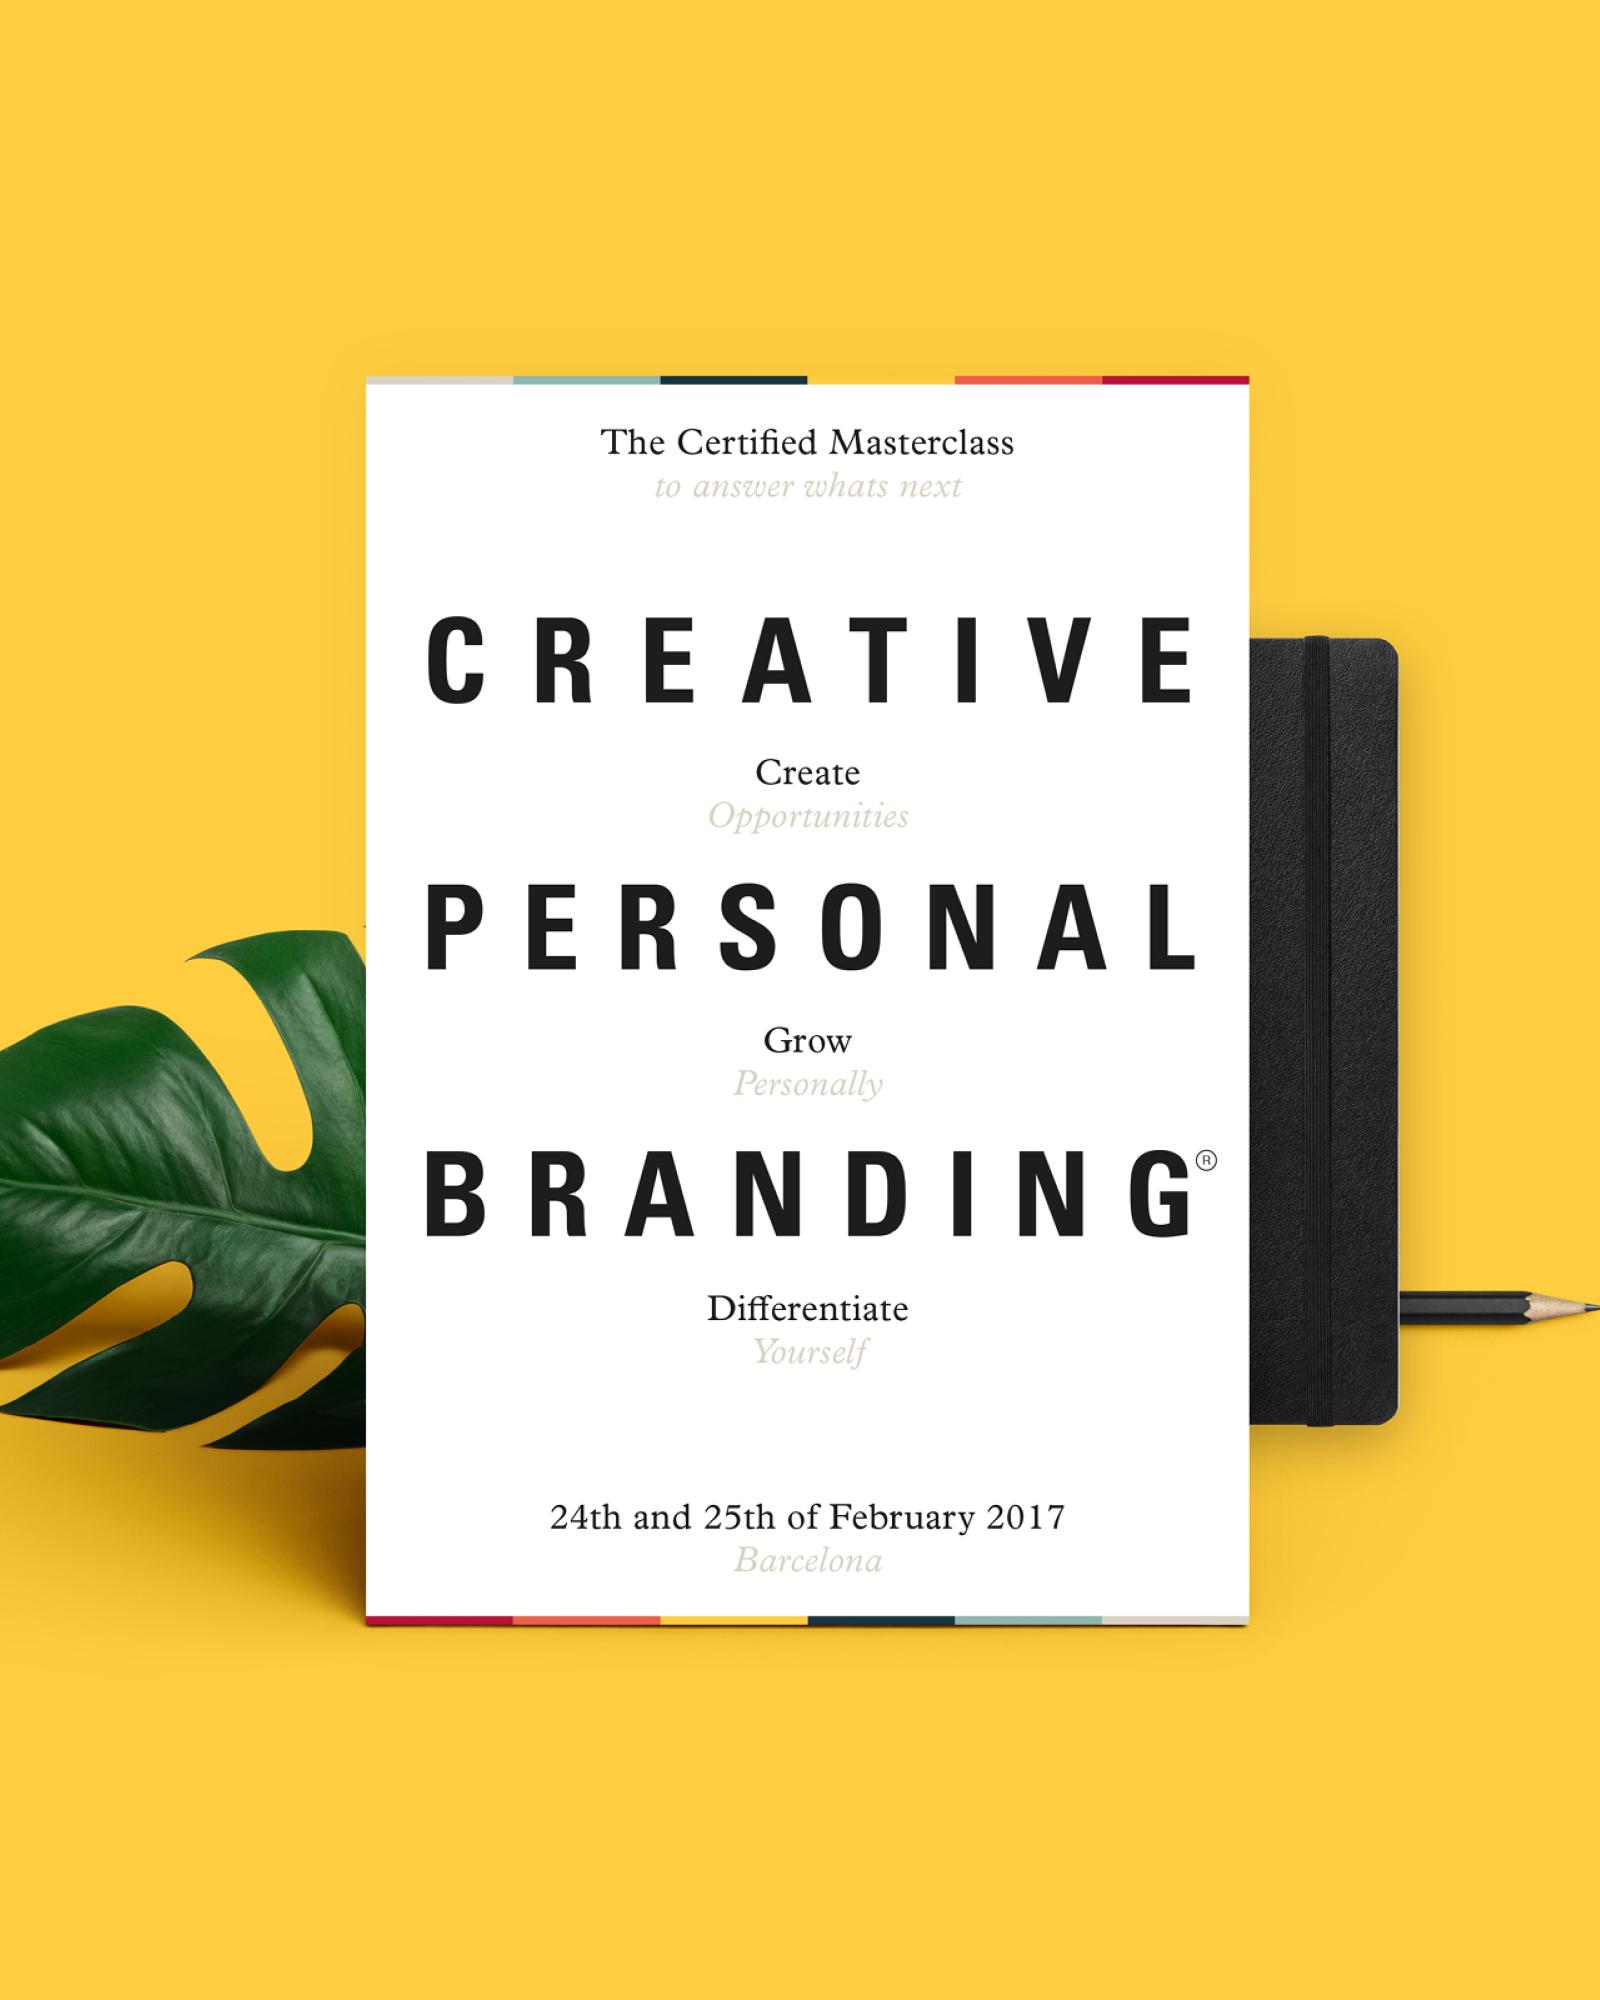 Bureau_Display_Identity_Graphic_Design_Grafik_Visual_Communication_Lucerne_Zurich_Creative_Personal_Branding_Barcelona_Thumb